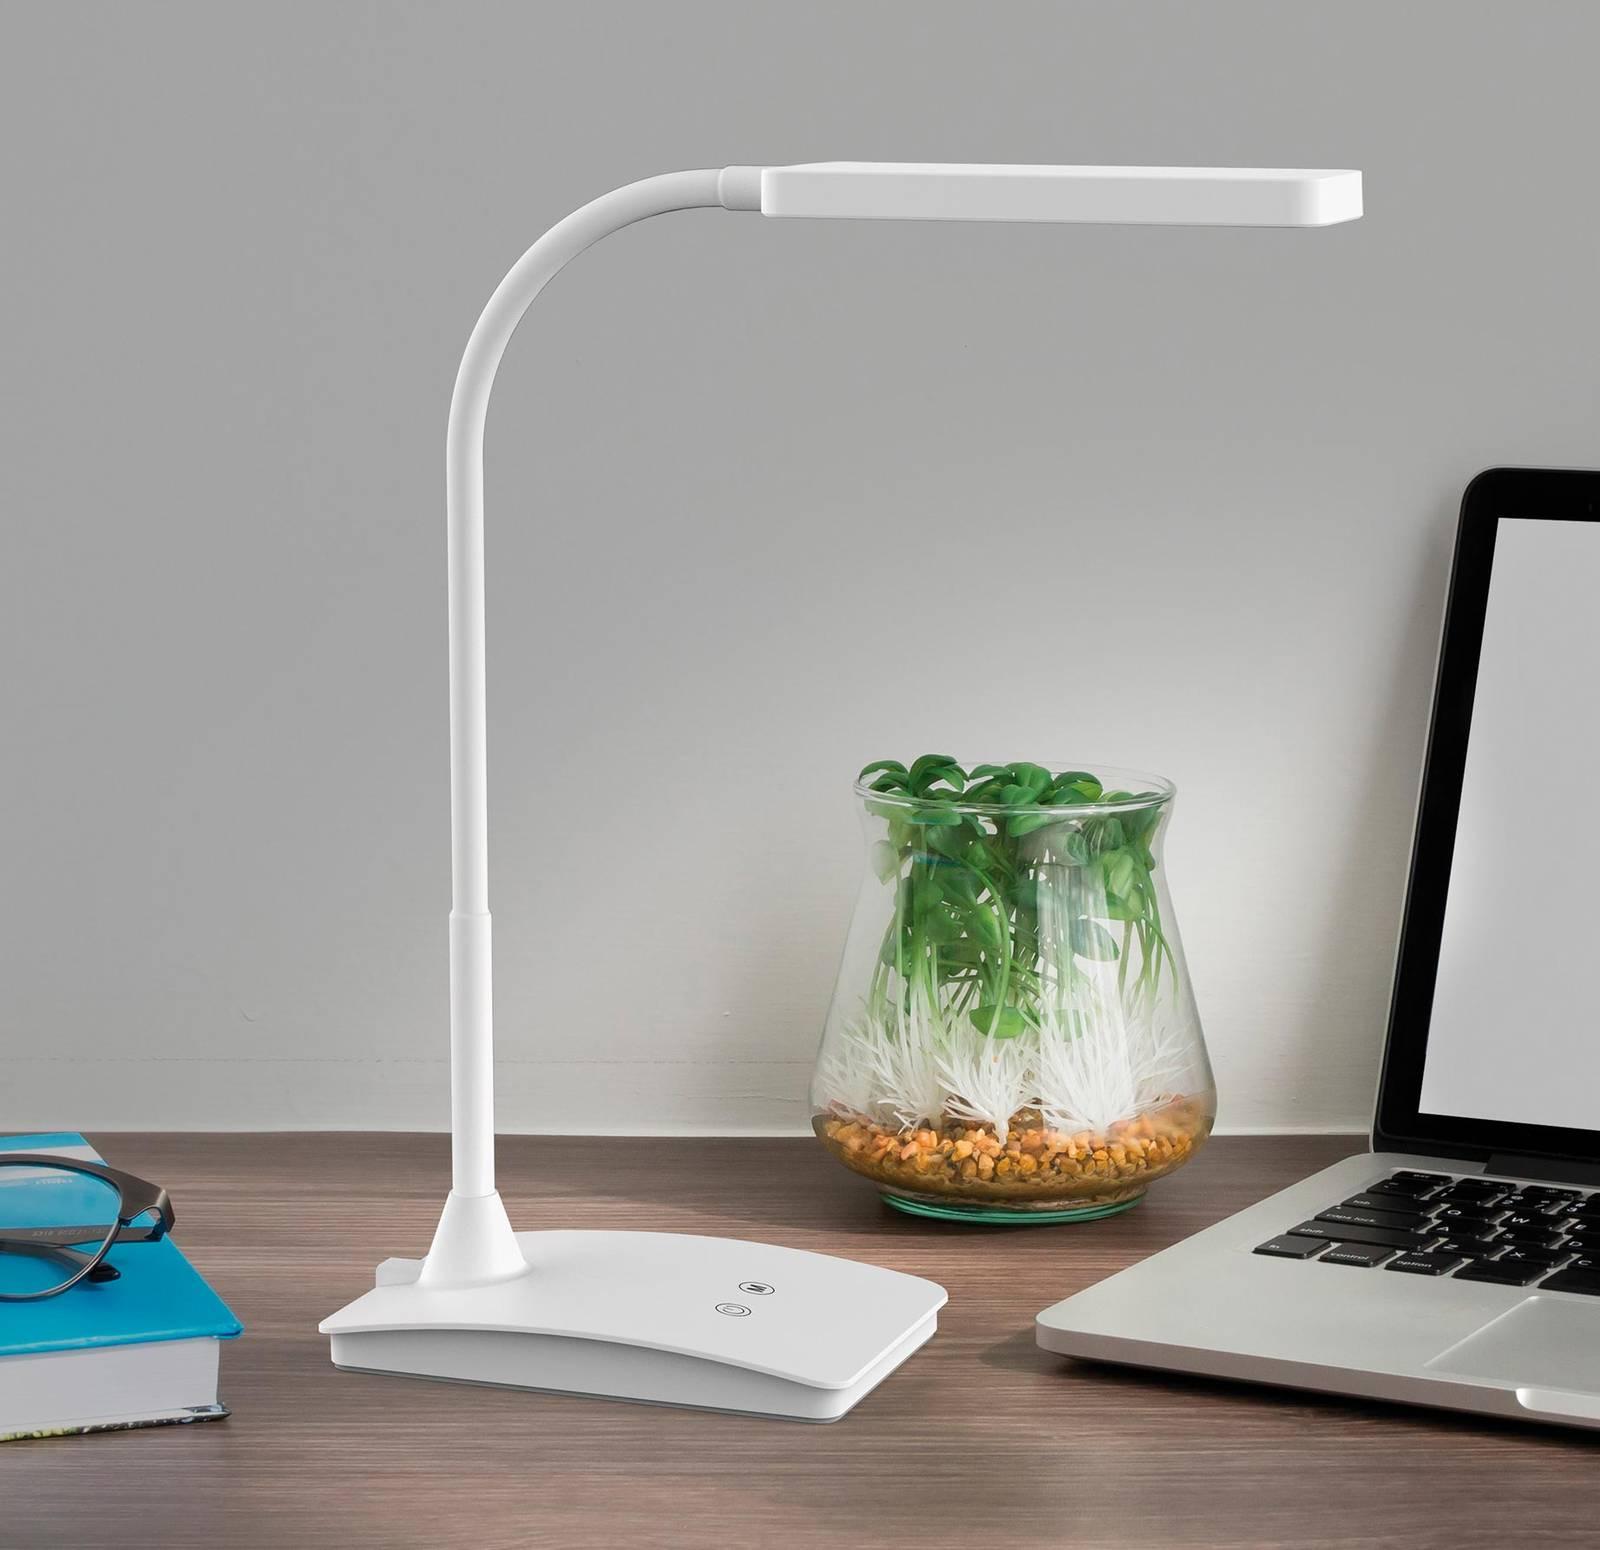 LED-työpöytälamppu MAULpearly colour vario